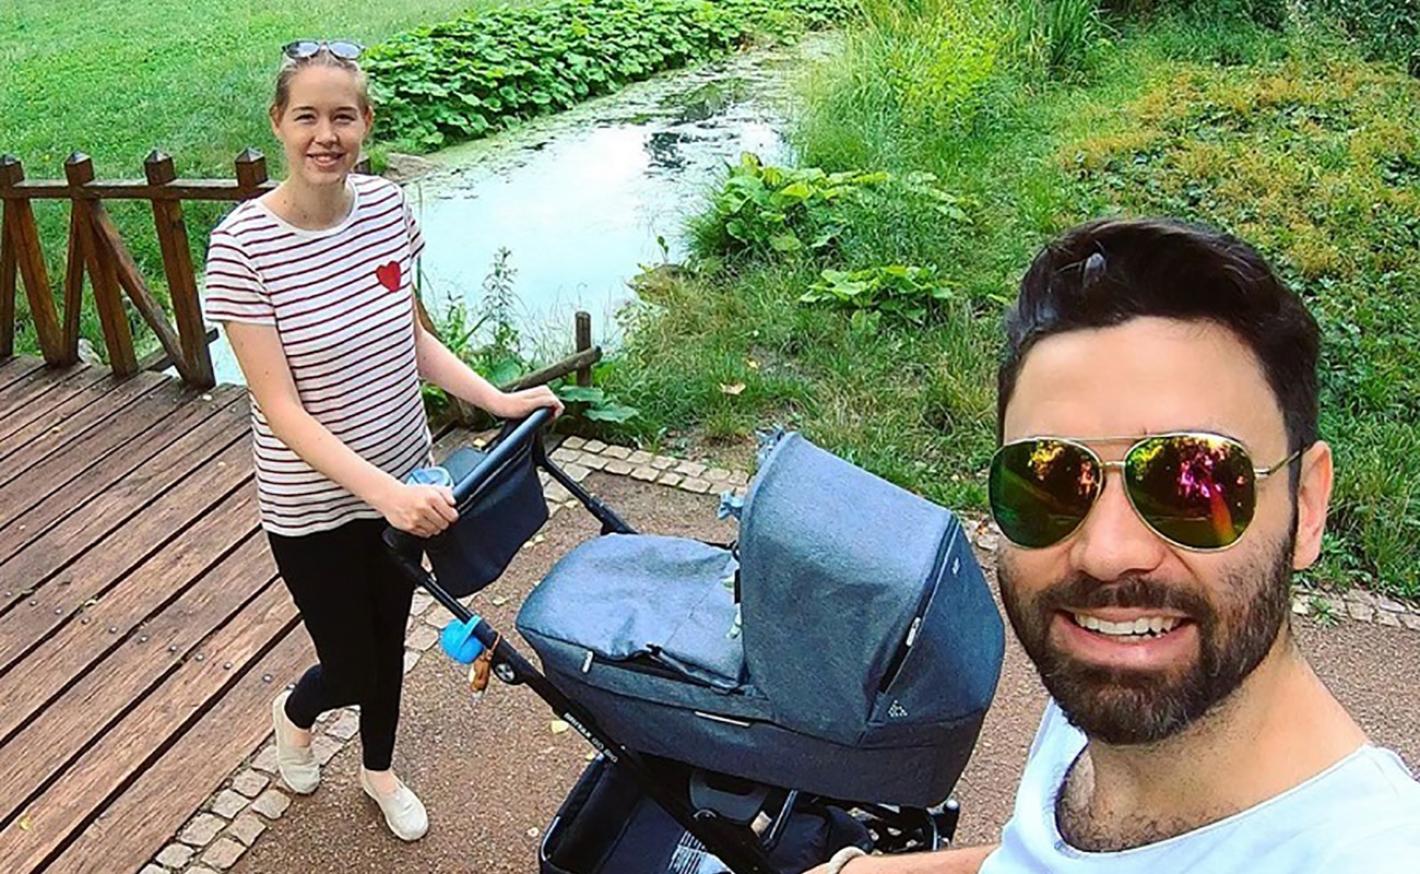 Katka Králová: U porodu mi pomohl kurz i babské rady